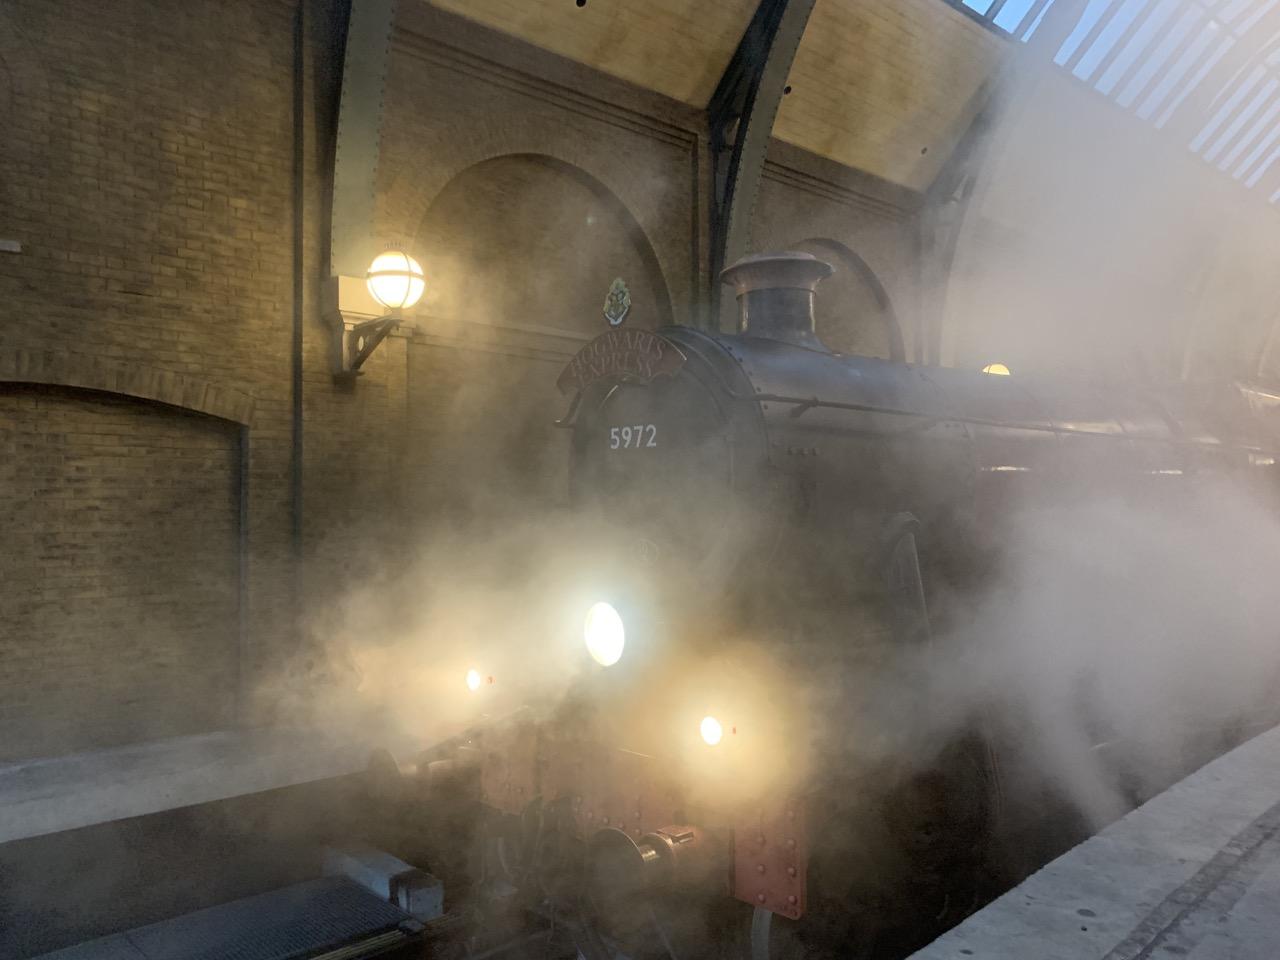 universal orlando summer 2019 trip report part 4 hogwarts express early.jpeg